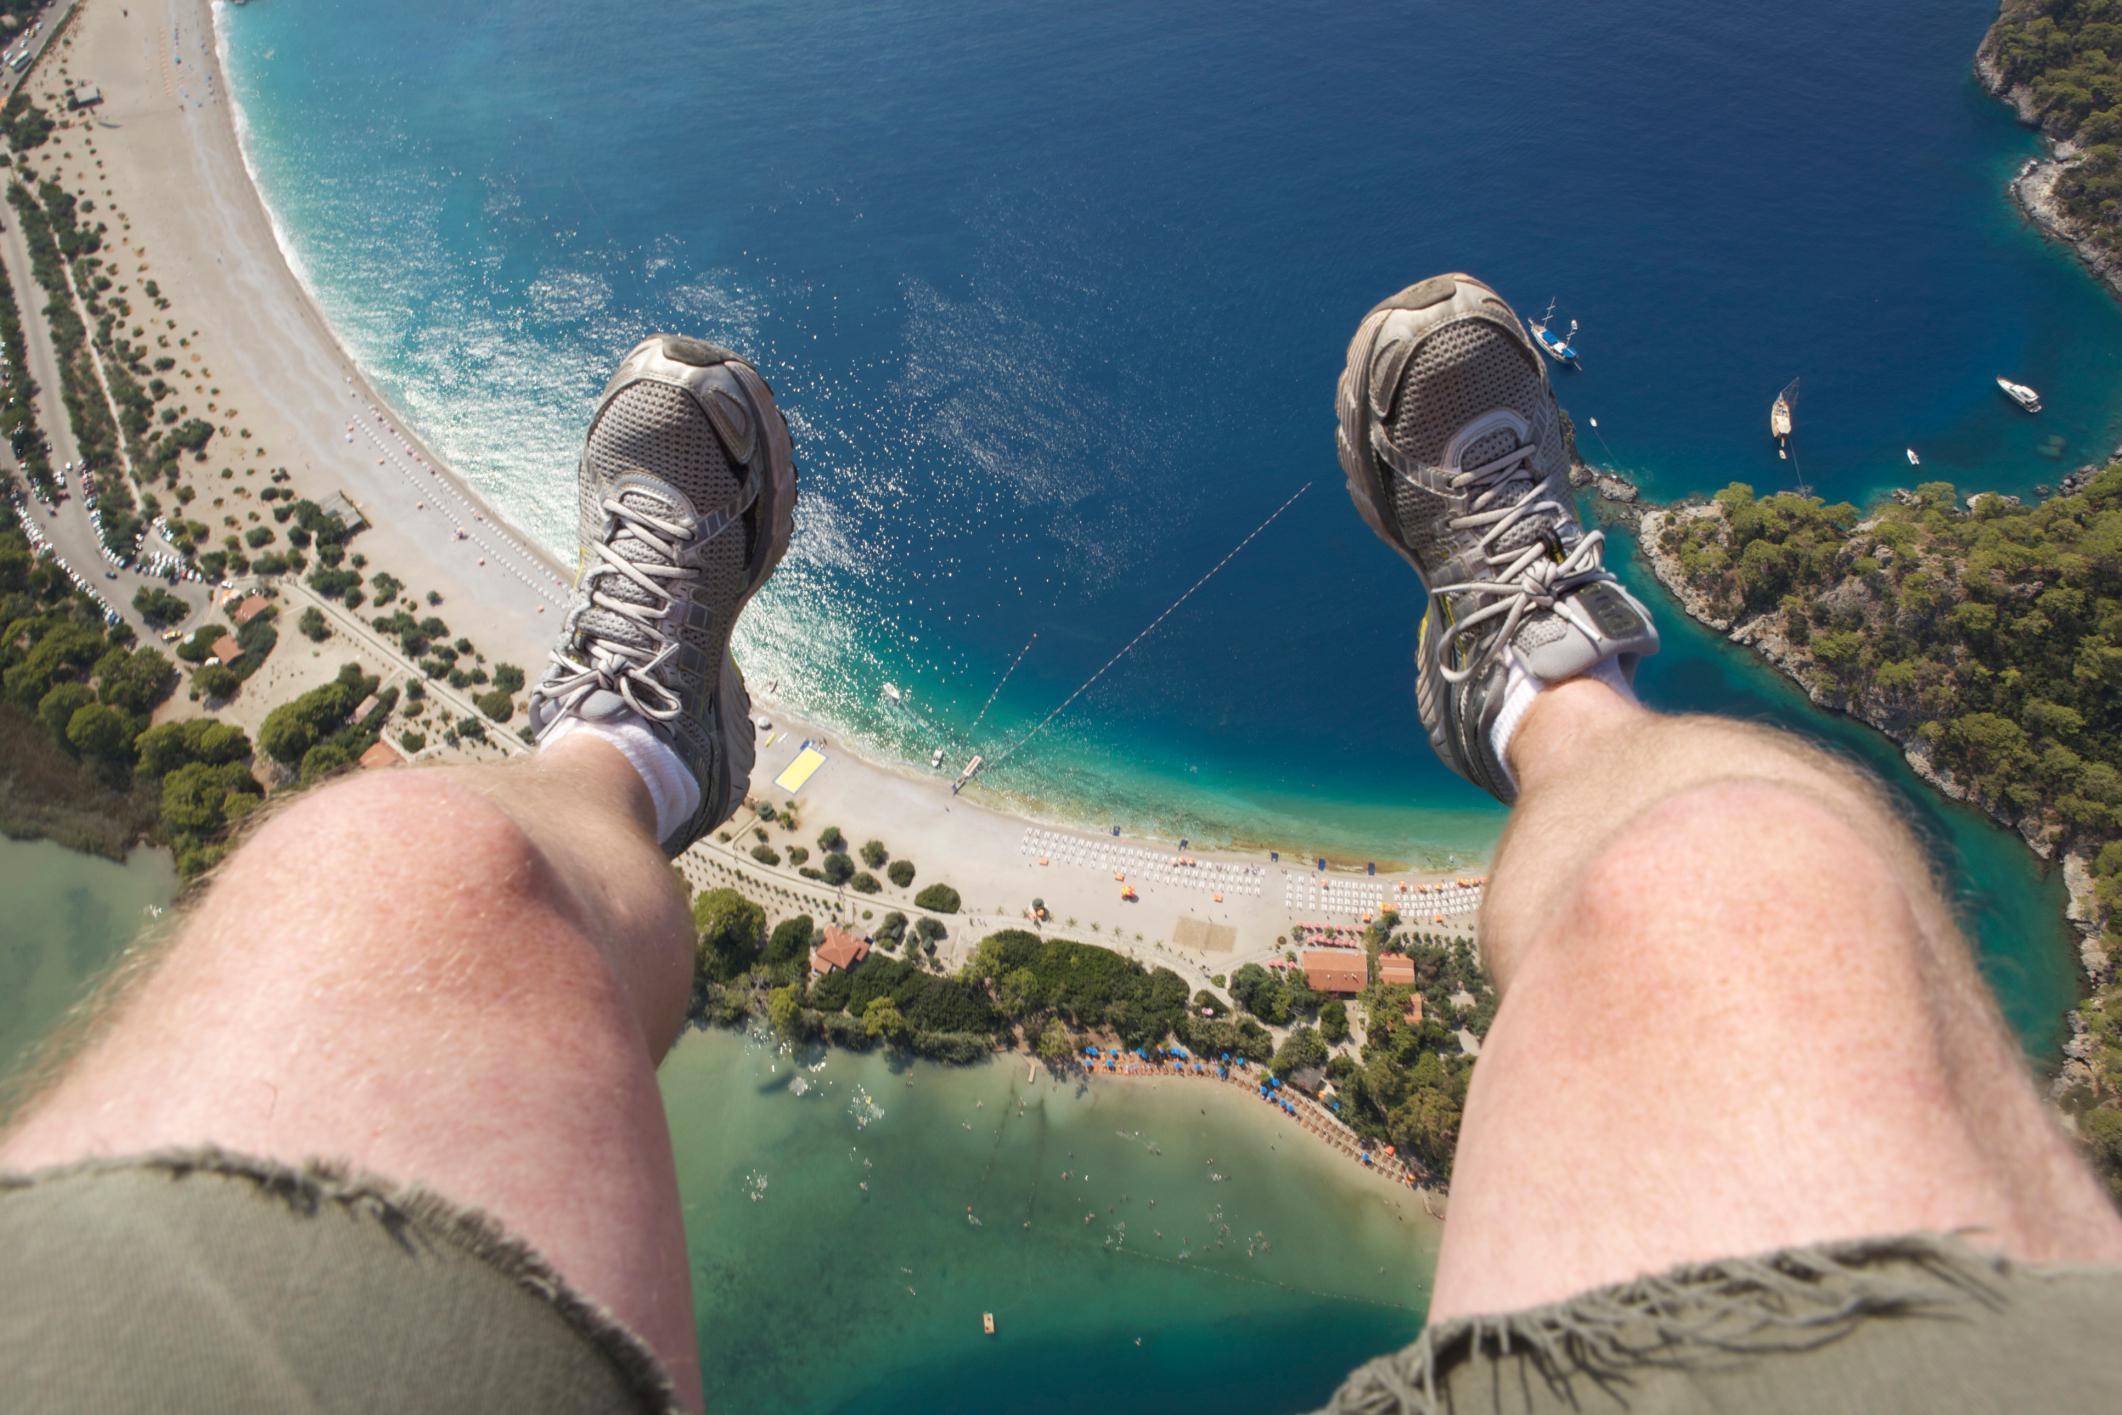 Paragliding in Fethiye